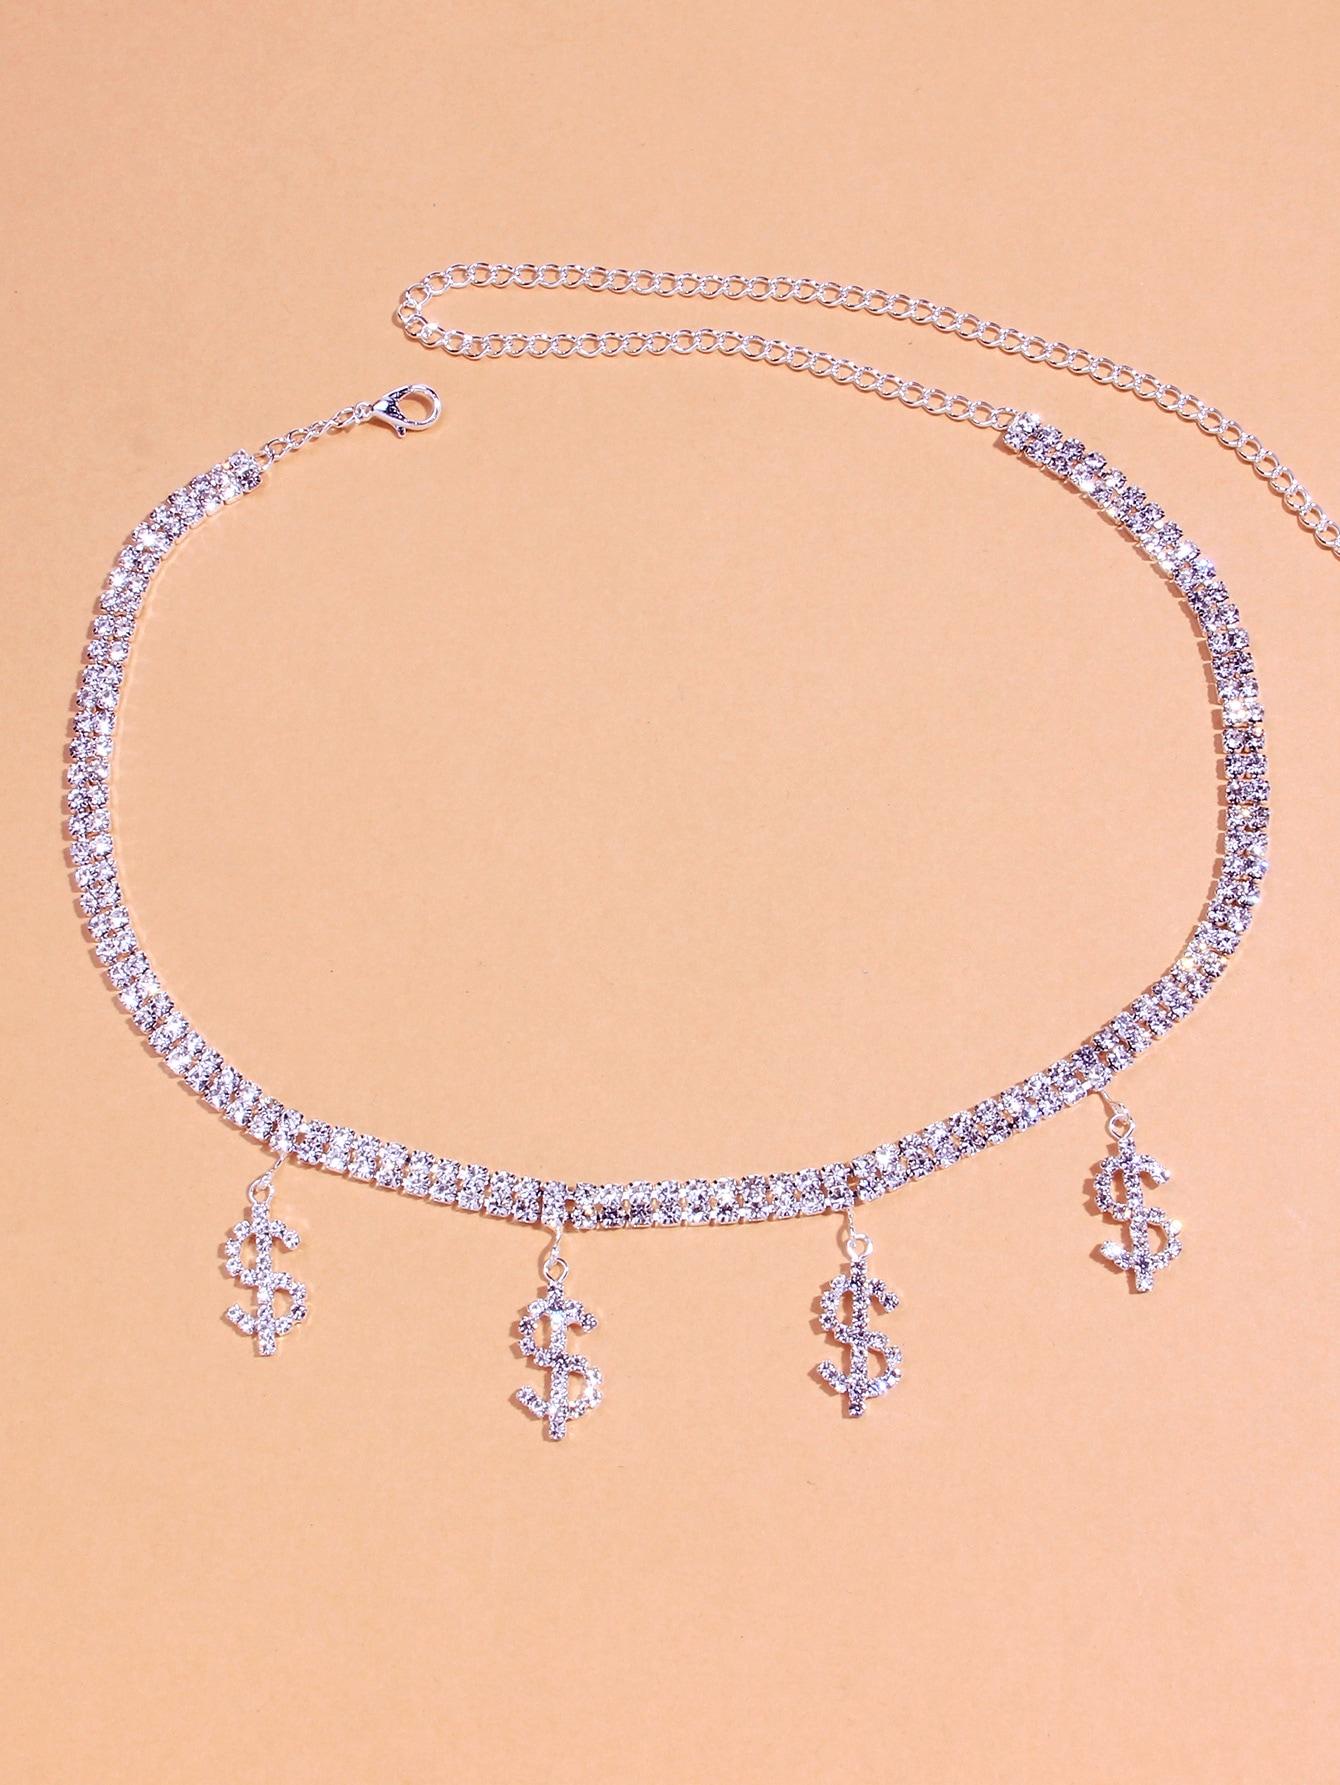 Rhinestone Decor Dollar Charm Necklace thumbnail